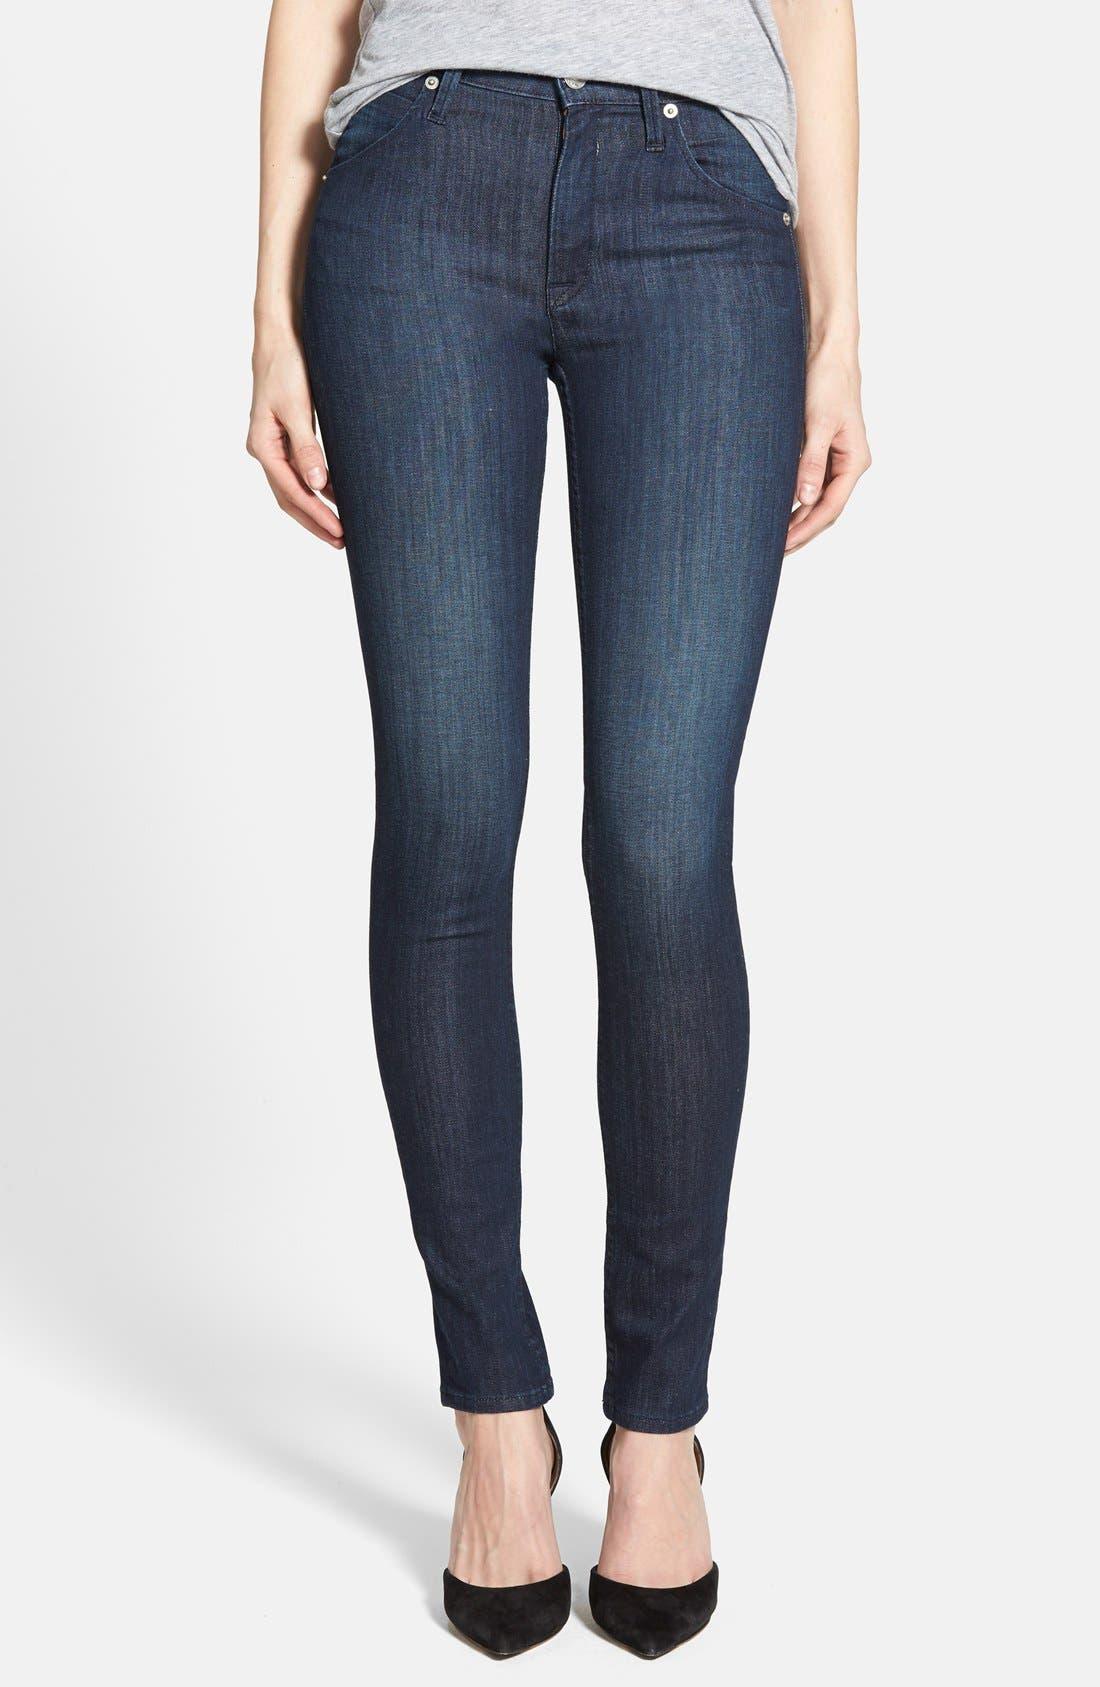 Alternate Image 1 Selected - Hudson Jeans 'Lynn' Ultra Skinny Jeans (Stella 2)